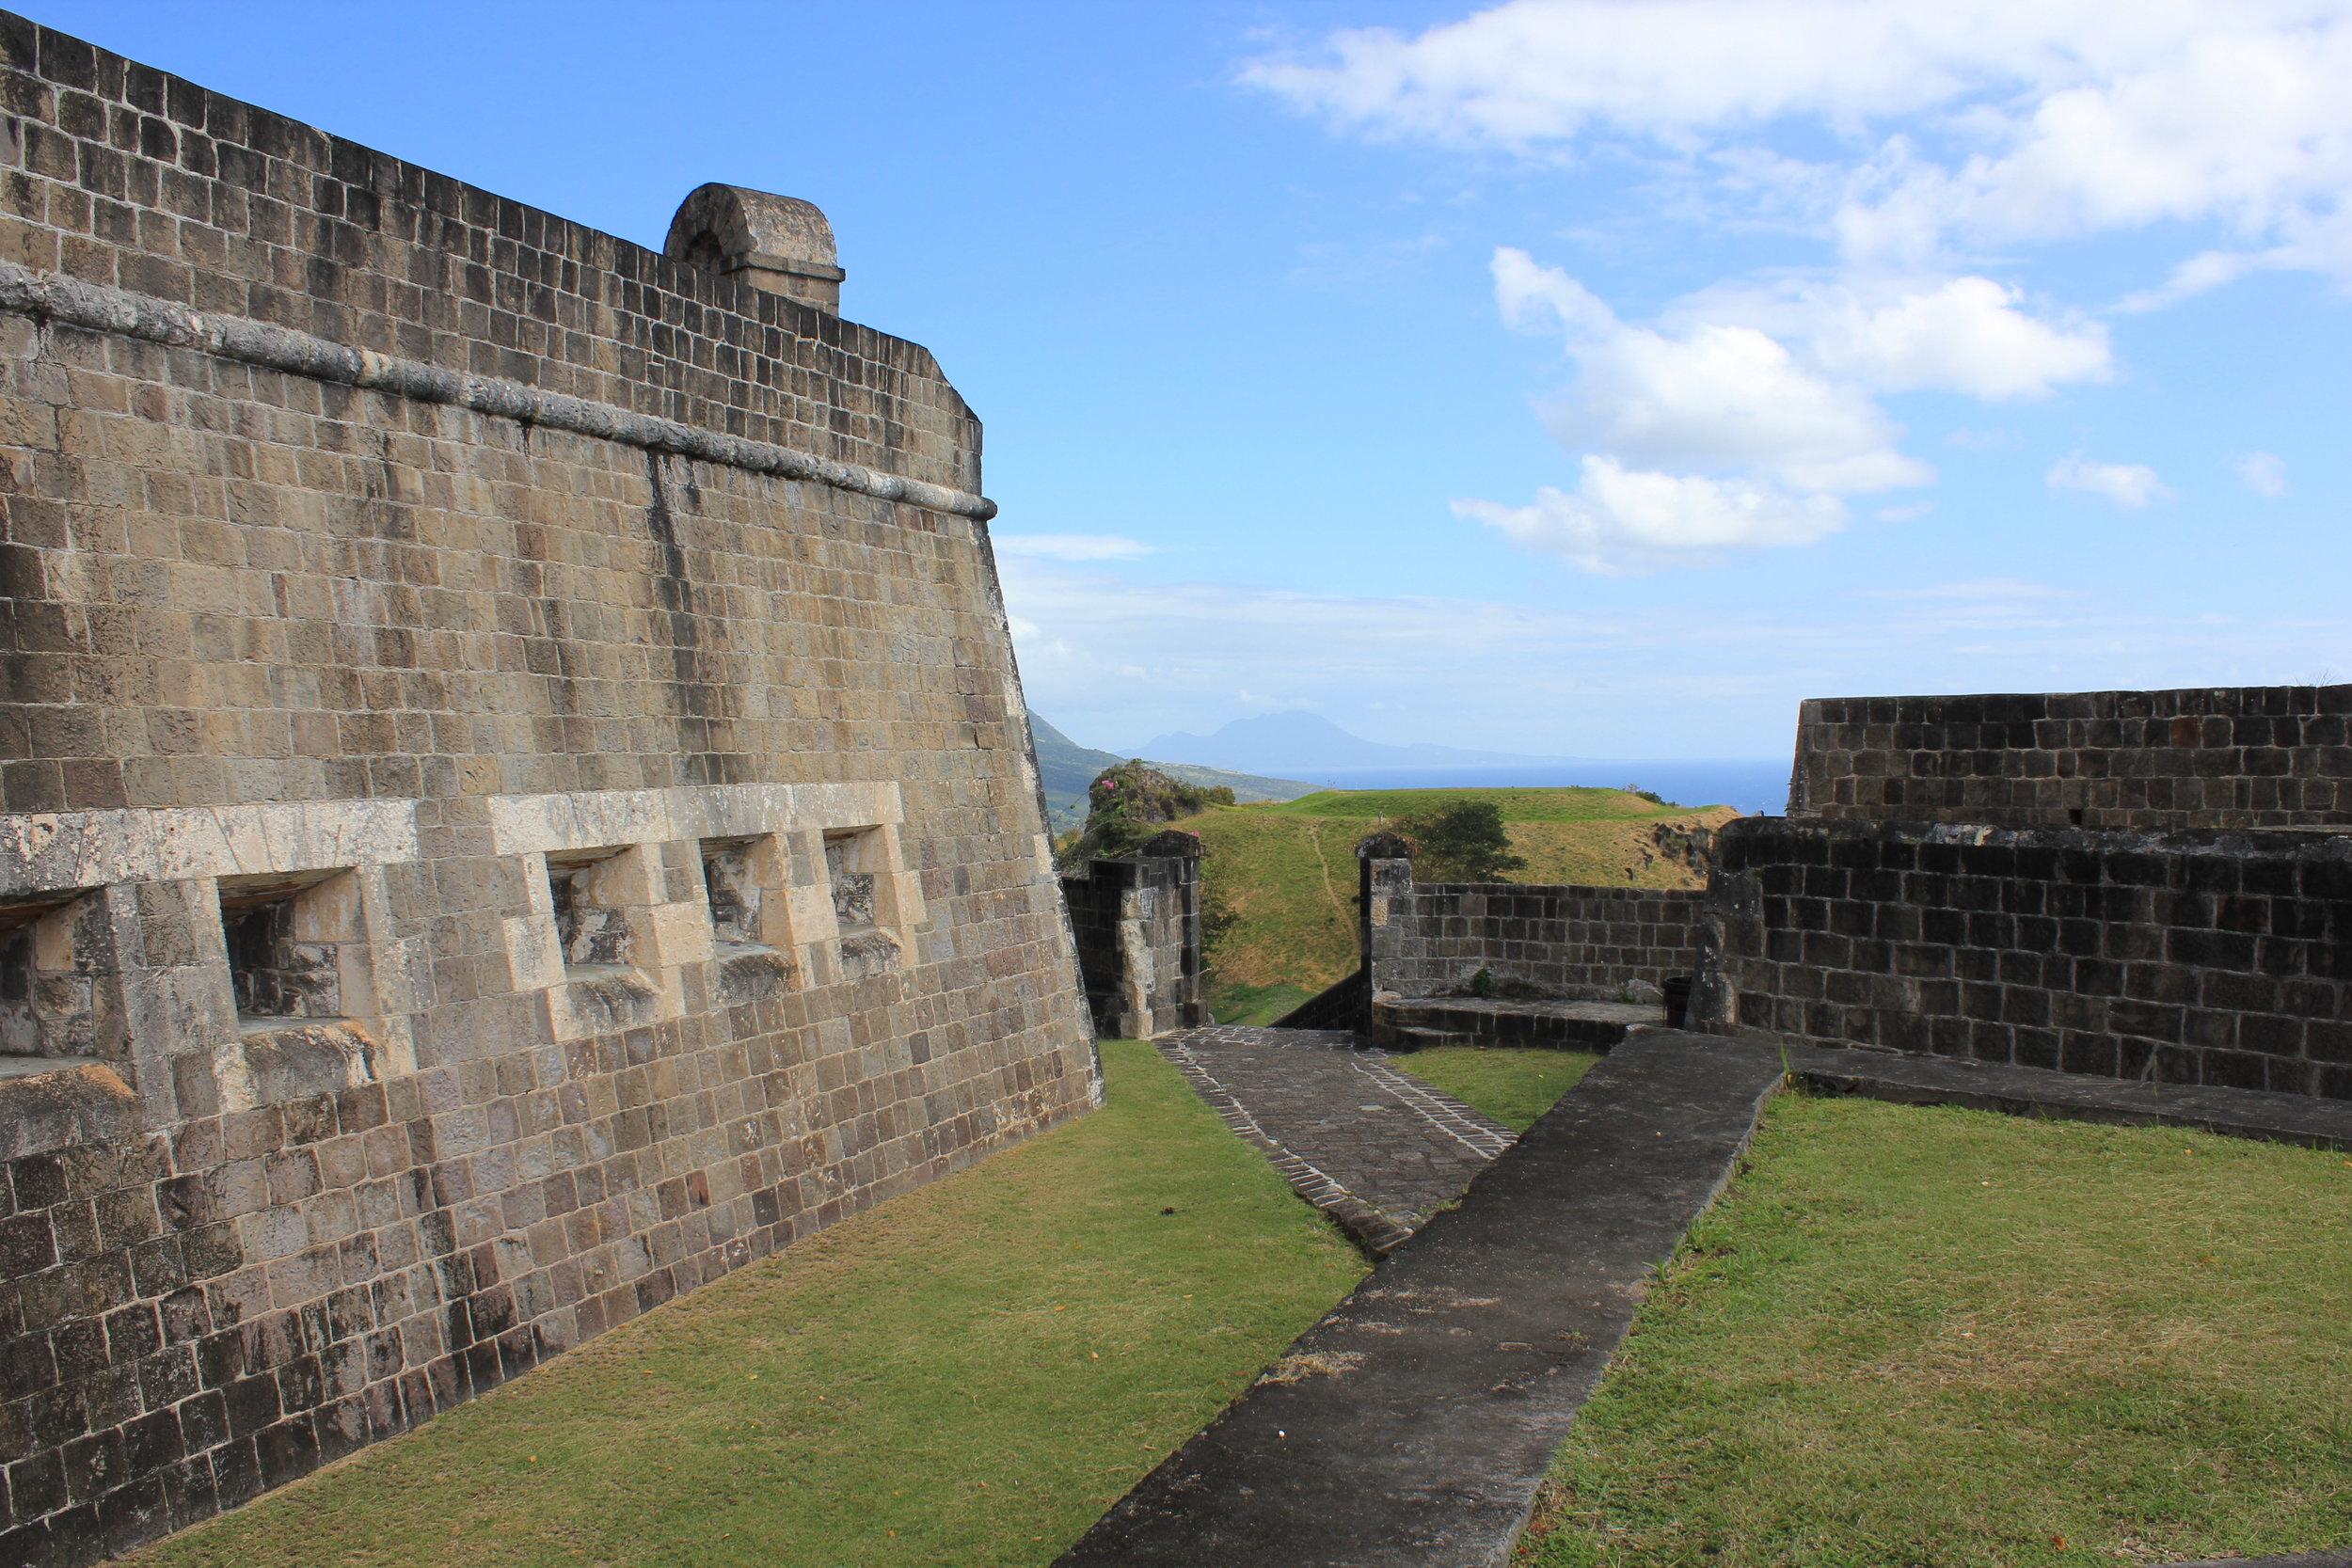 Brimstone Hill Fortress National Park – Bastion